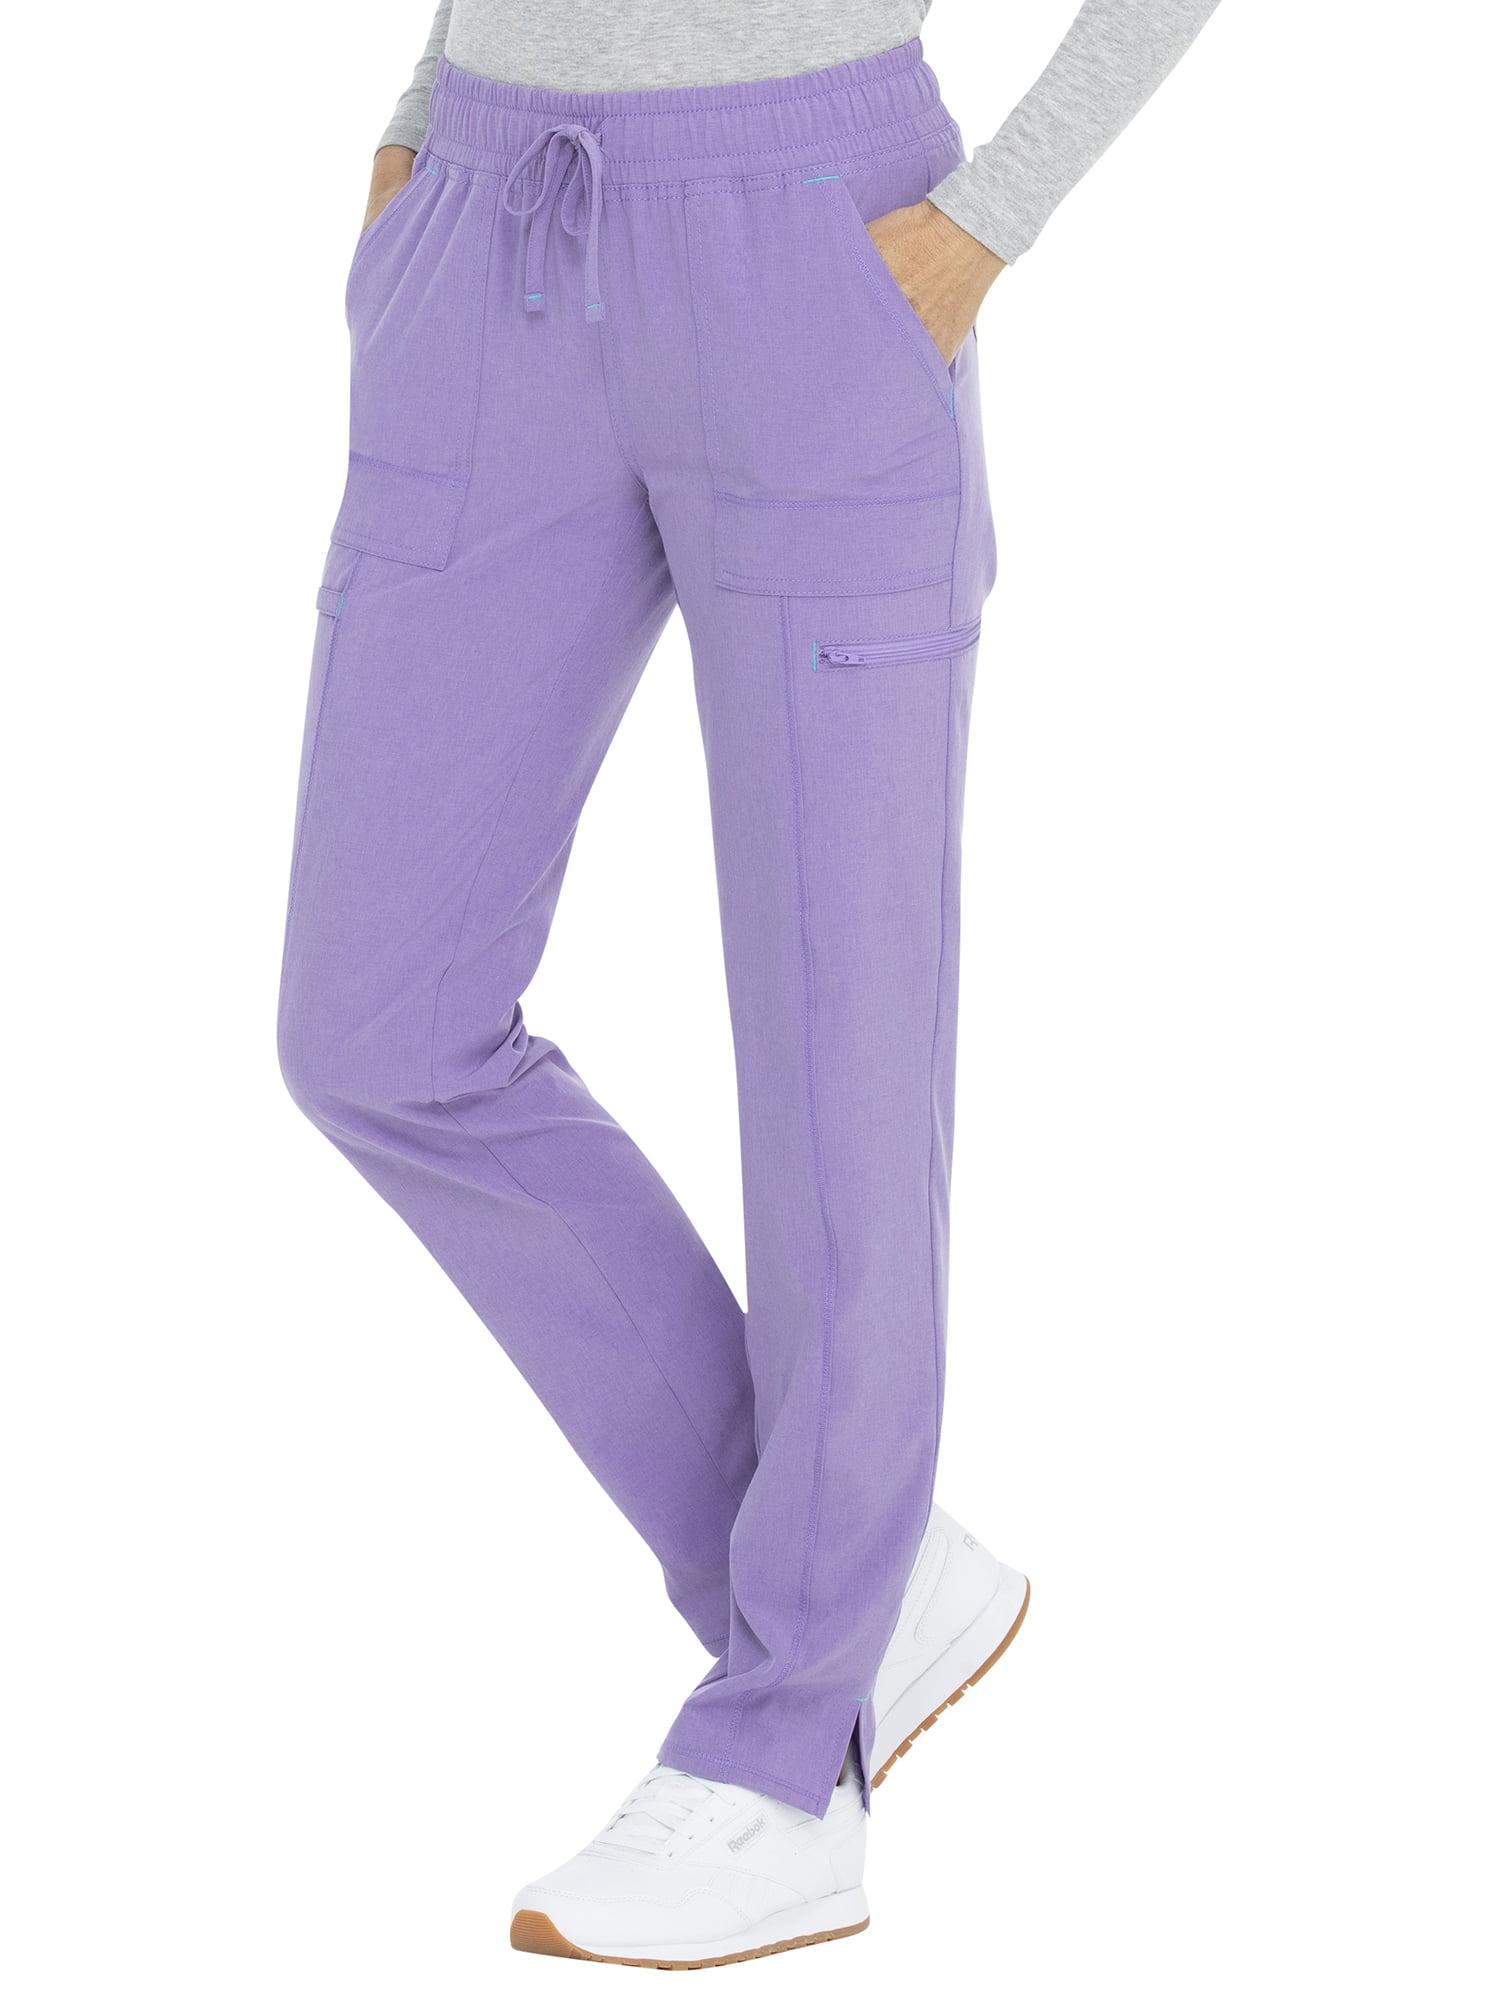 feca904a39d Scrubstar - Scrubstar Women's Premium Collection Rayon Drawstring Scrub Pant  - Walmart.com